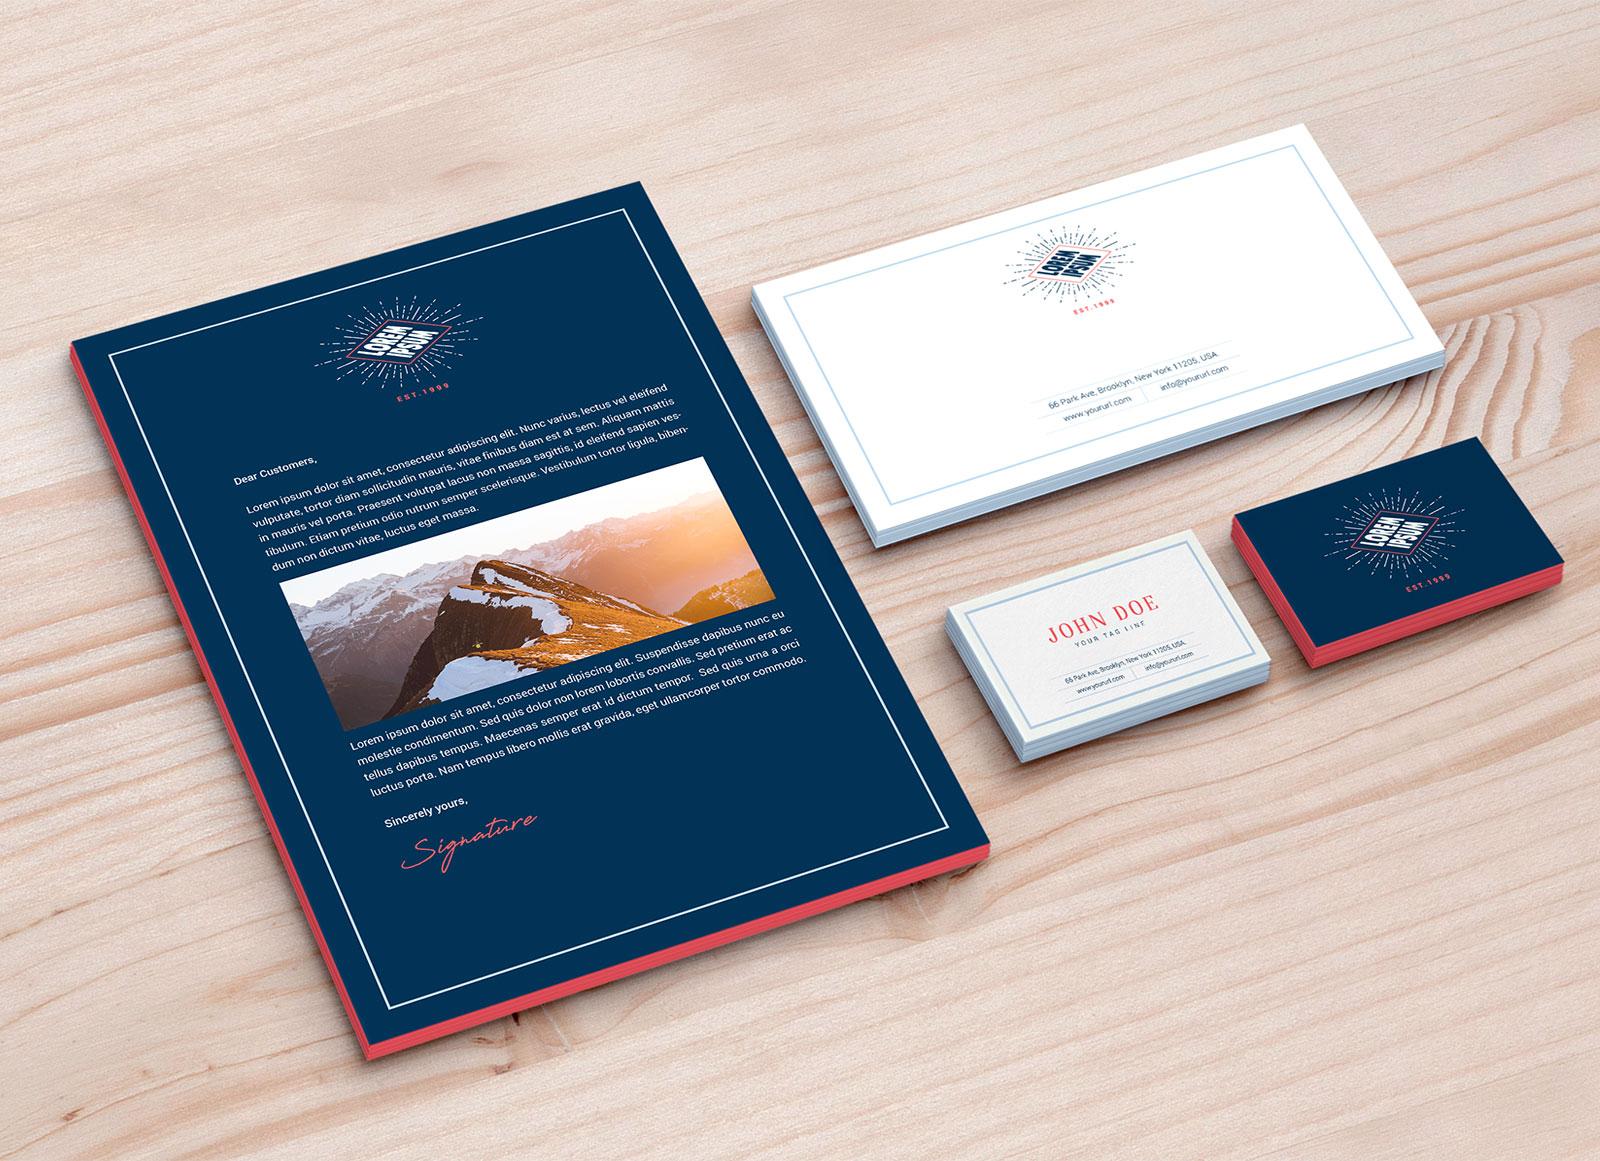 Free-Essential-Stationery-Branding-Mockup-PSD-file